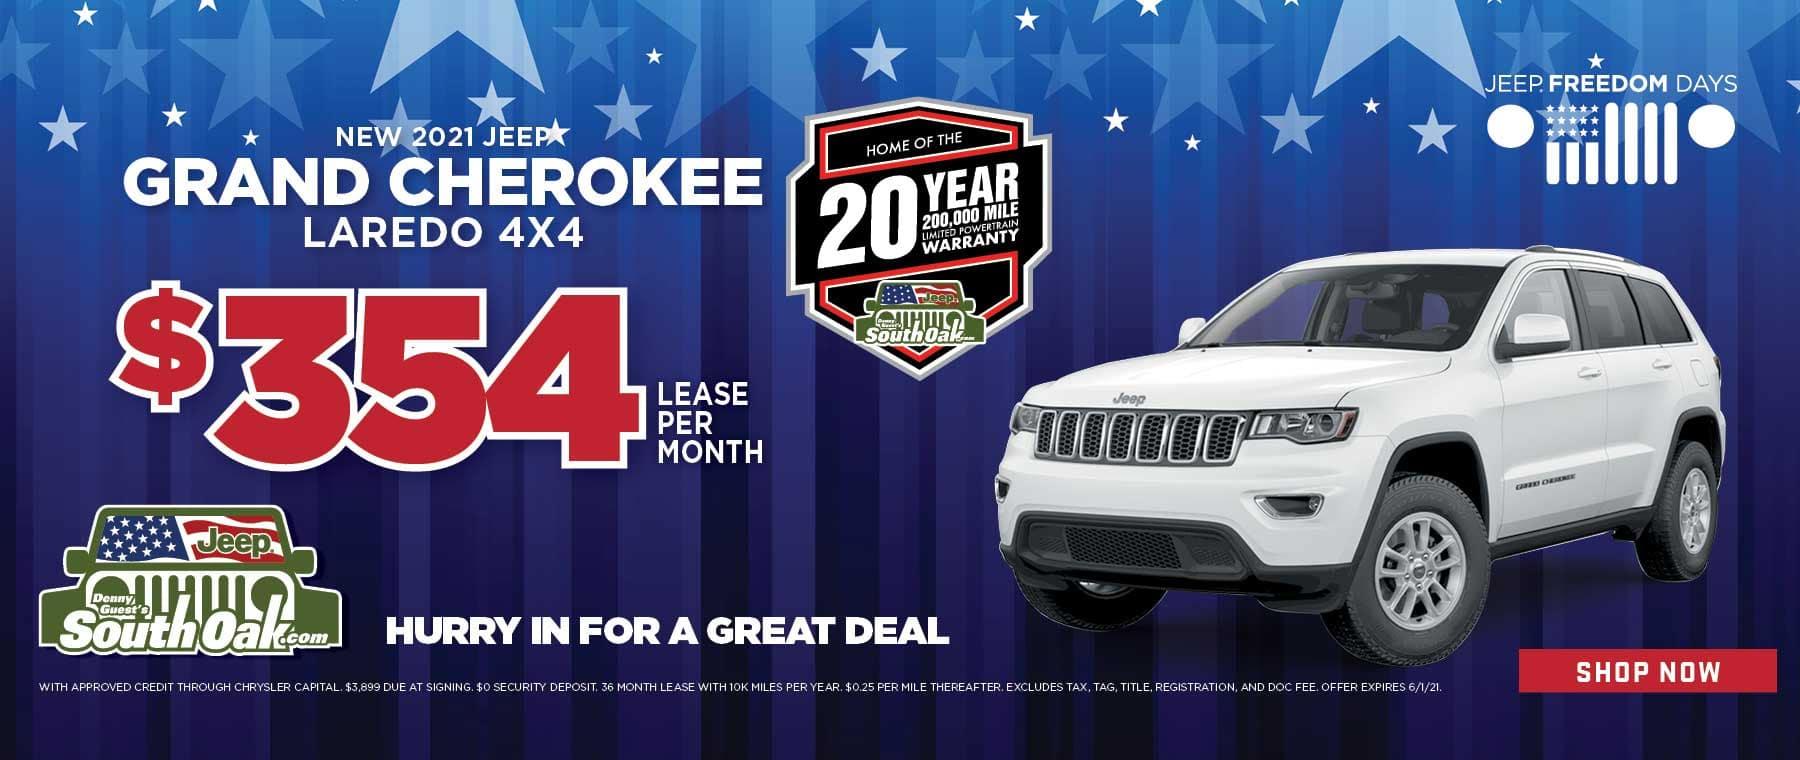 2021 Jeep Grand Cherokee Sale